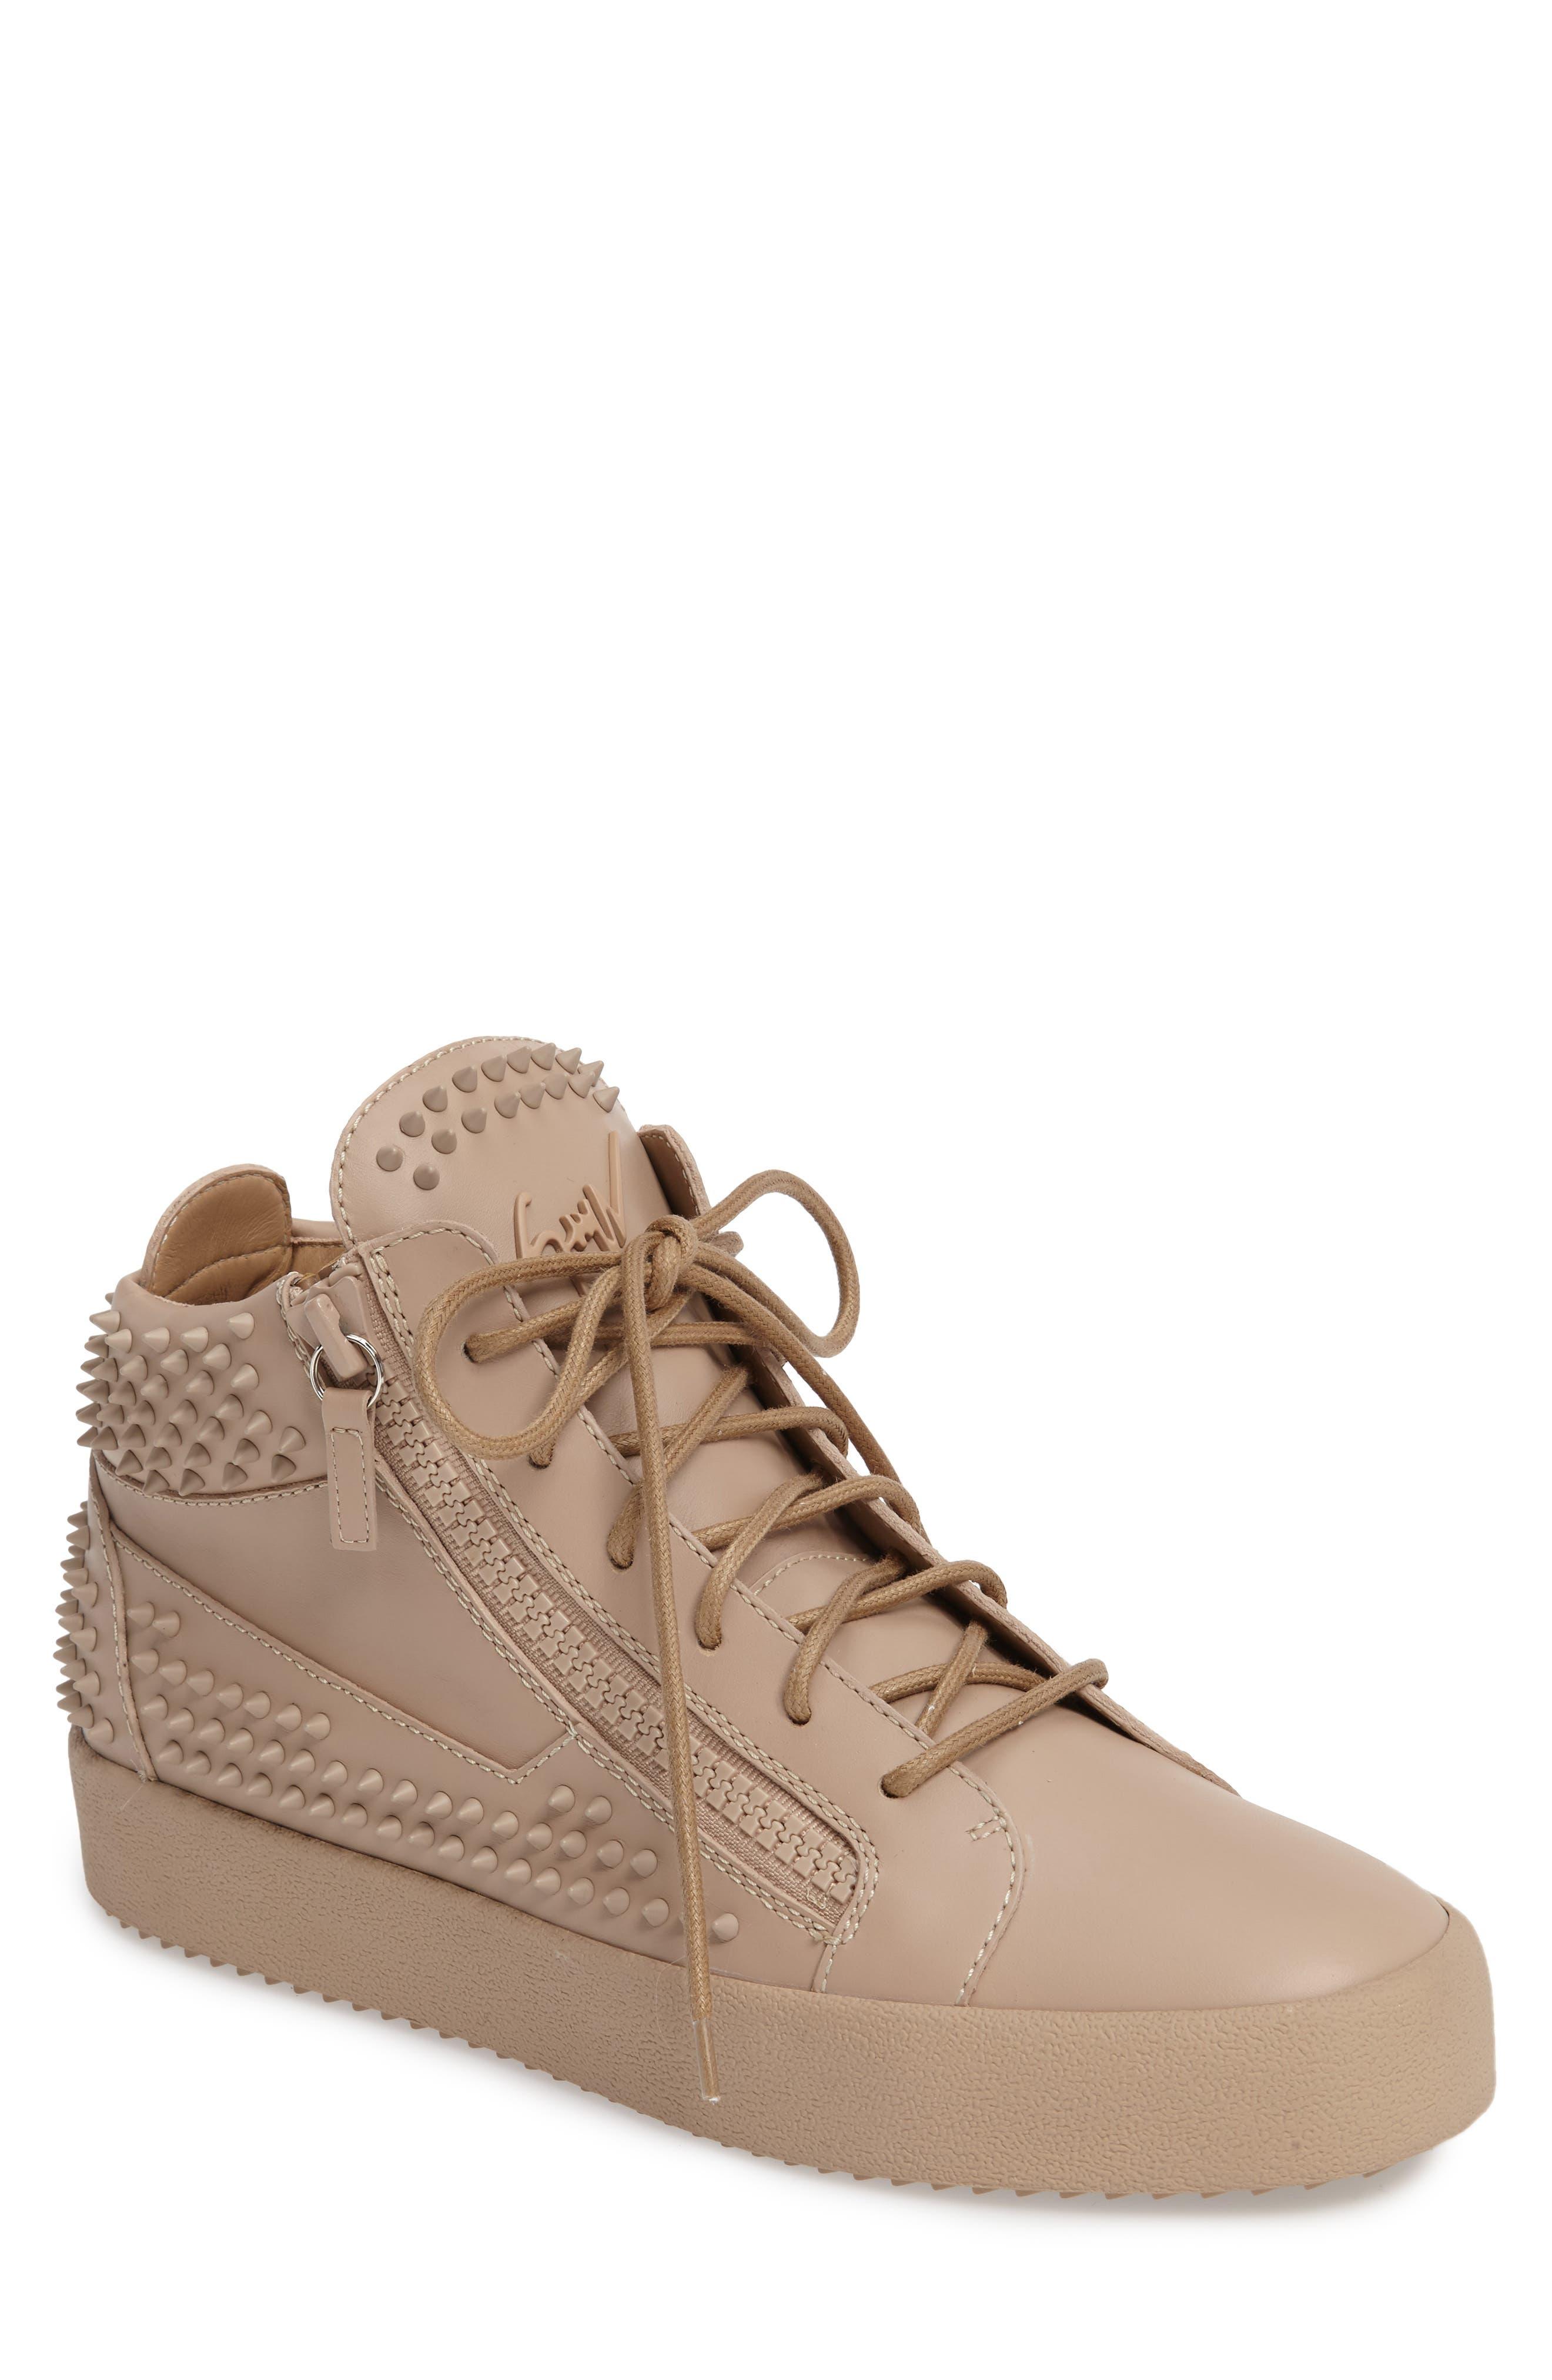 Studded Mid Top Sneaker,                             Main thumbnail 1, color,                             Tan/ Birel Sughero